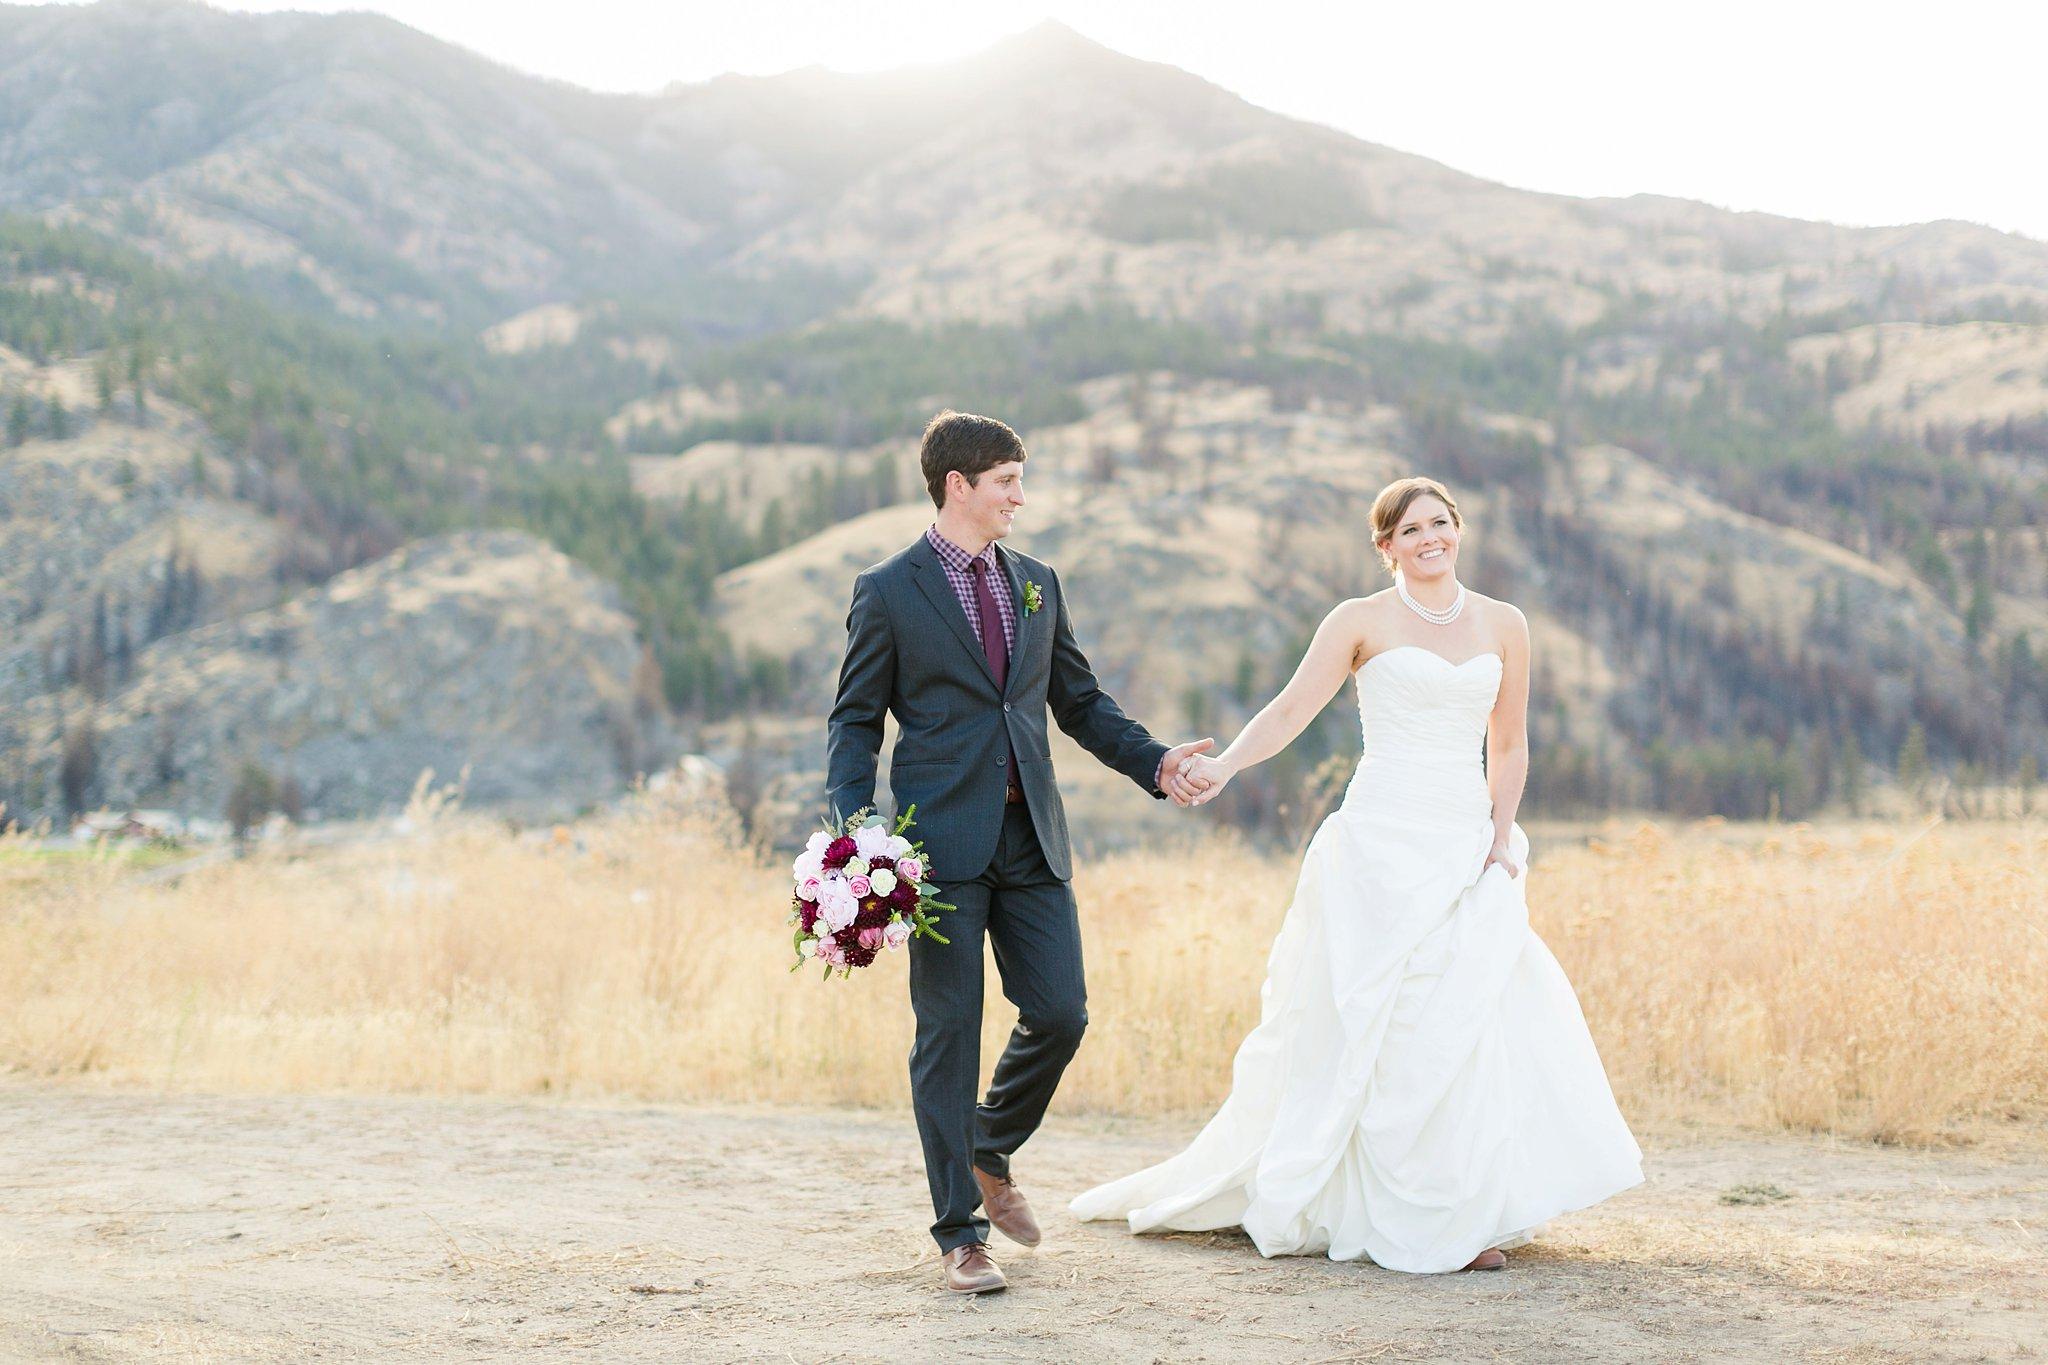 Chelan Washington Wedding Photos Megan Kelsey Photography Delight Wedding Workshop Styled Shoot Annalee & Scot-127.jpg